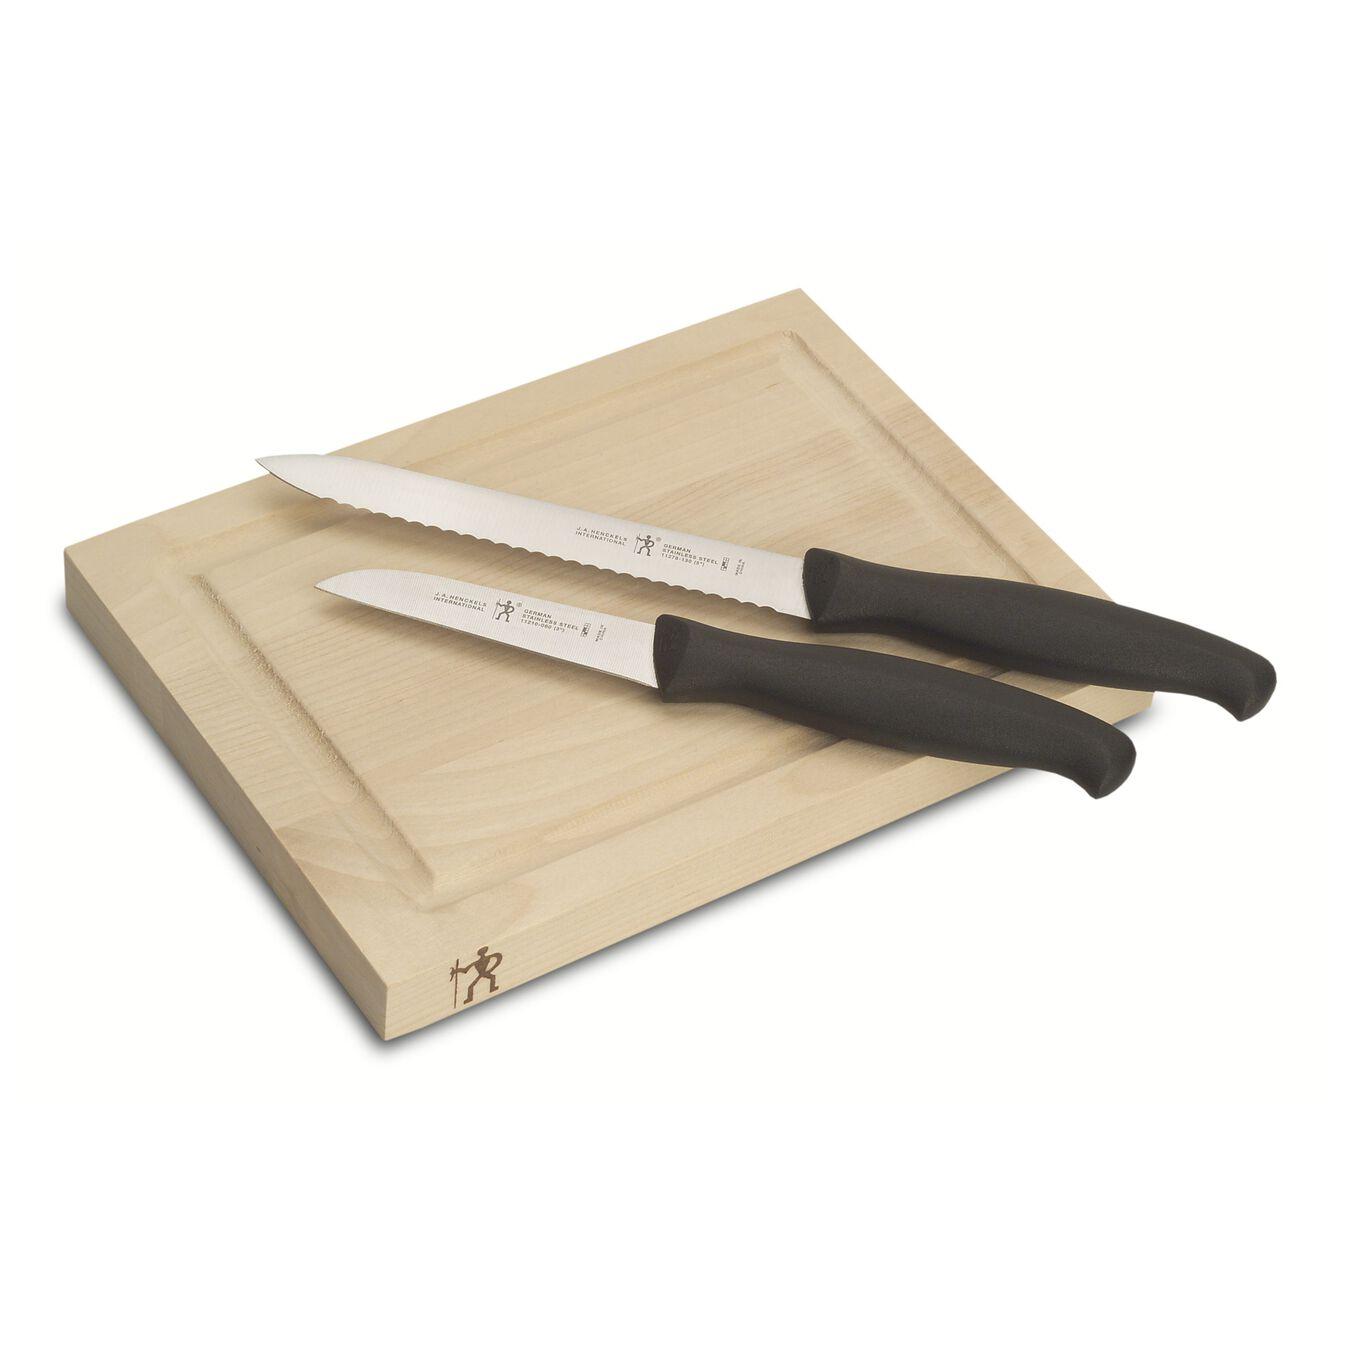 3-pc Bar Knife & Board Set,,large 1